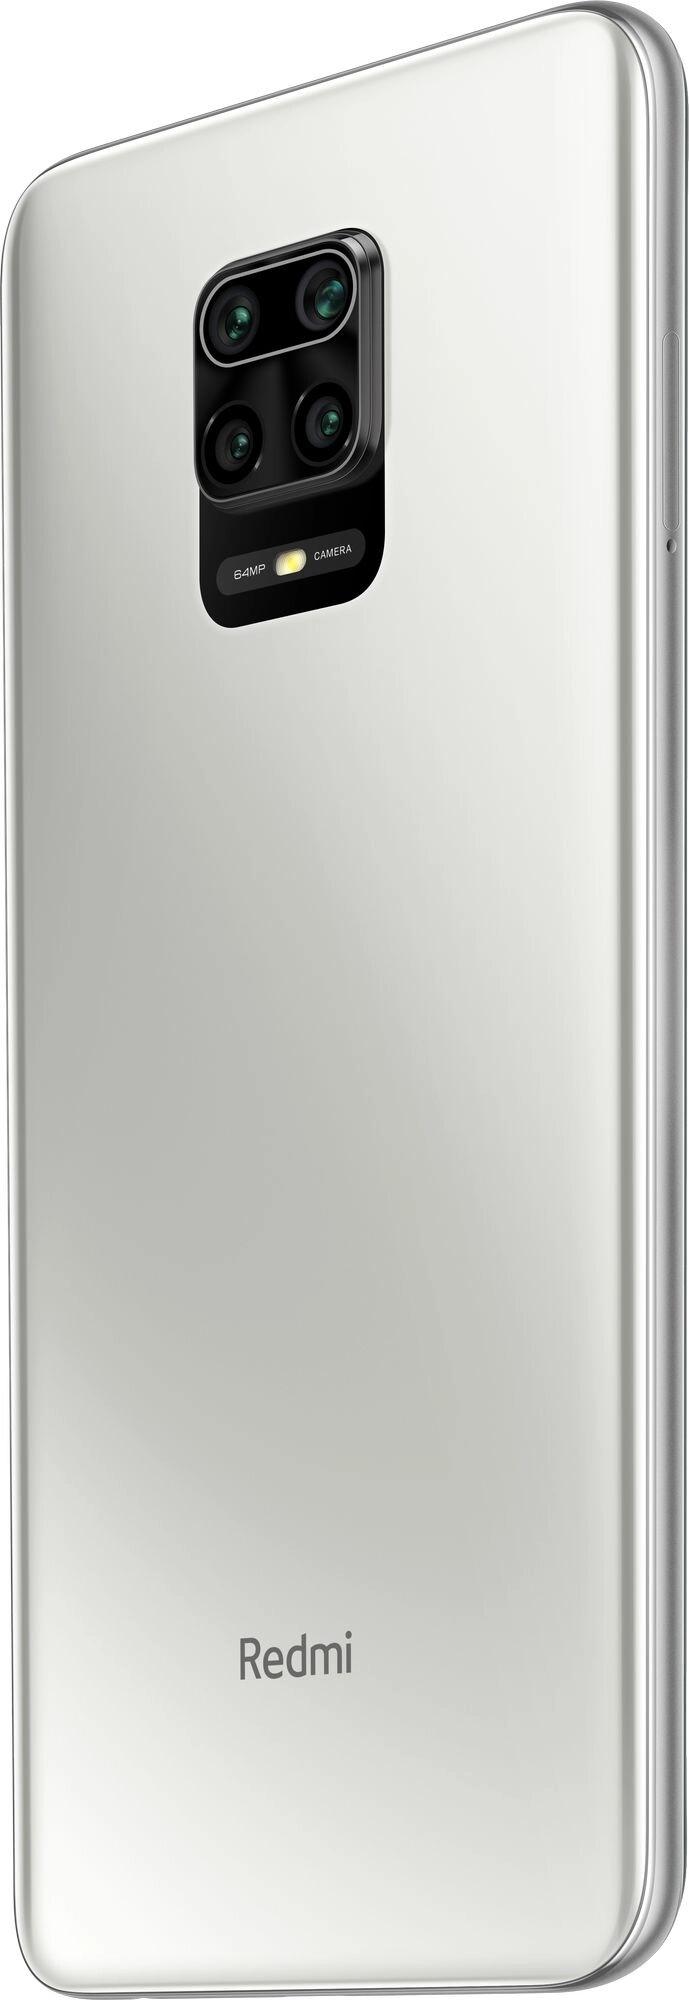 Xiaomi Redmi Note 9 Pro 6/128GB White - 4